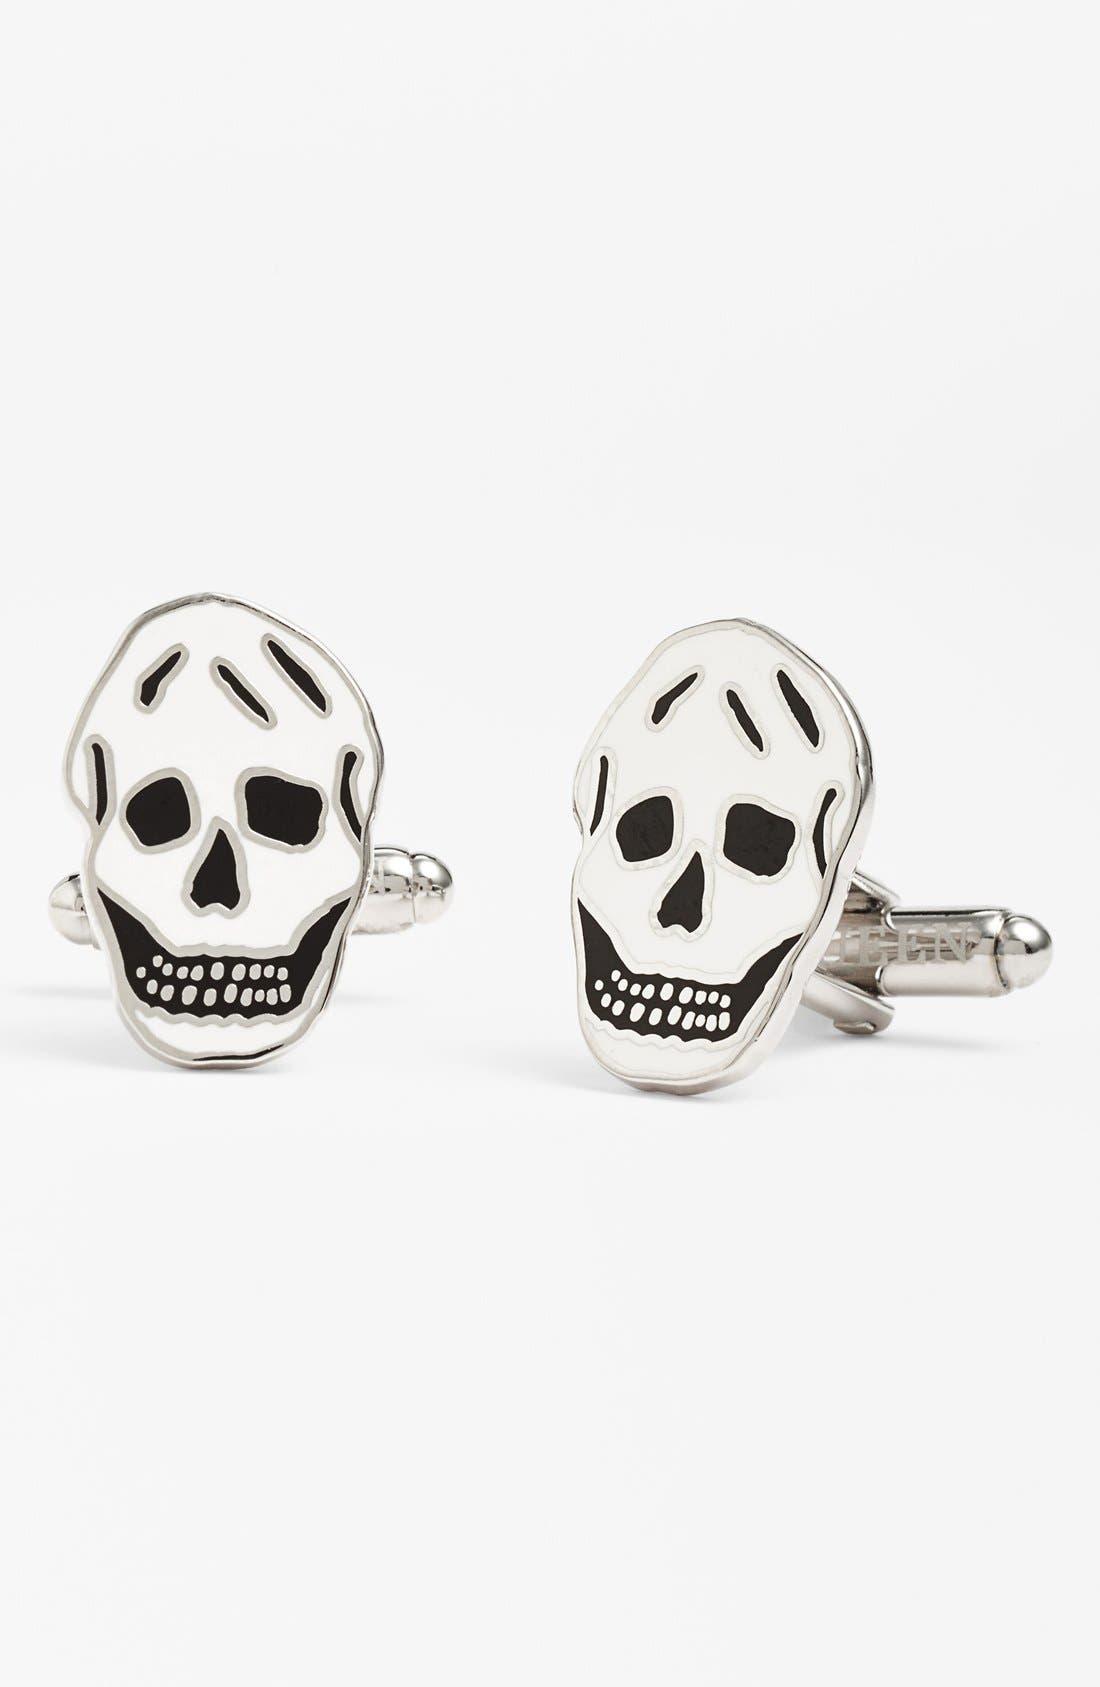 Brass Skull Cuff Links,                         Main,                         color, Black/White